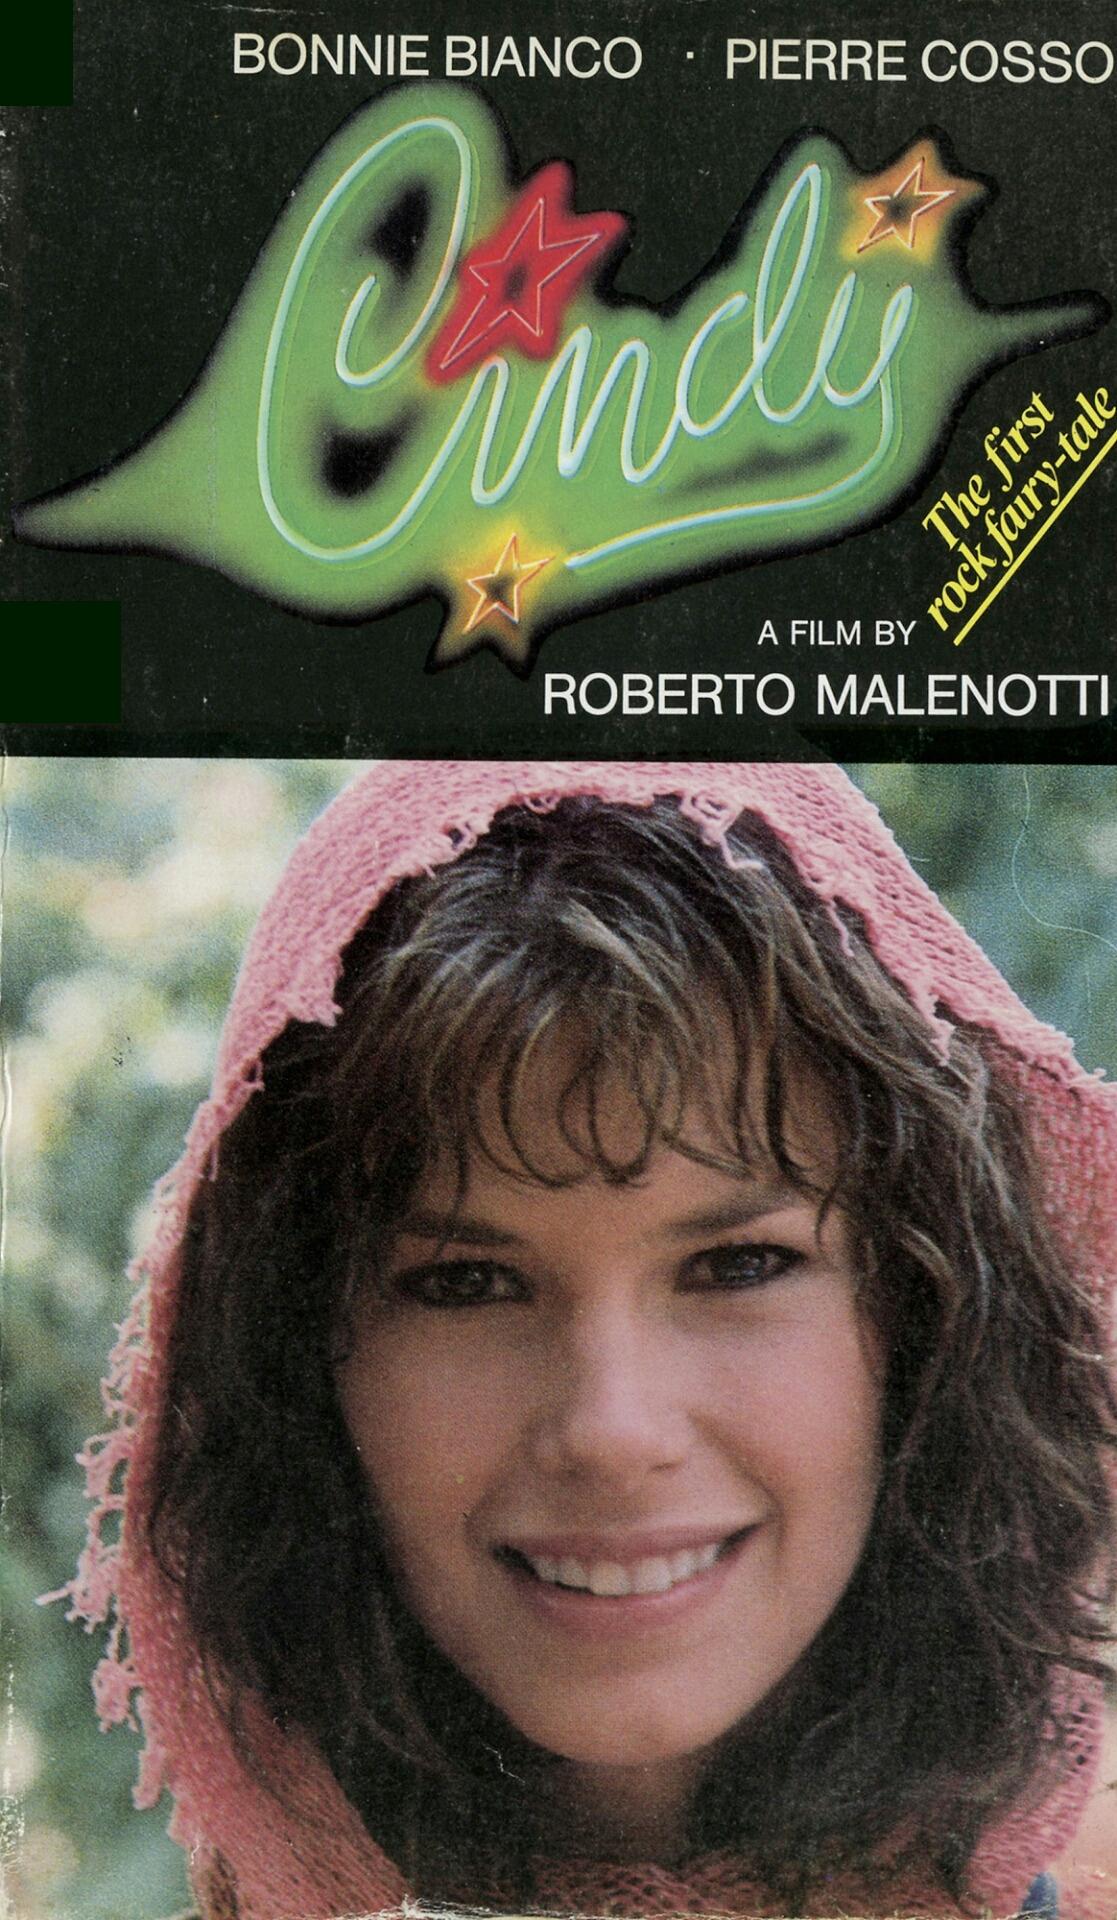 Bonnie Bianco in Cenerentola '80 (1984)